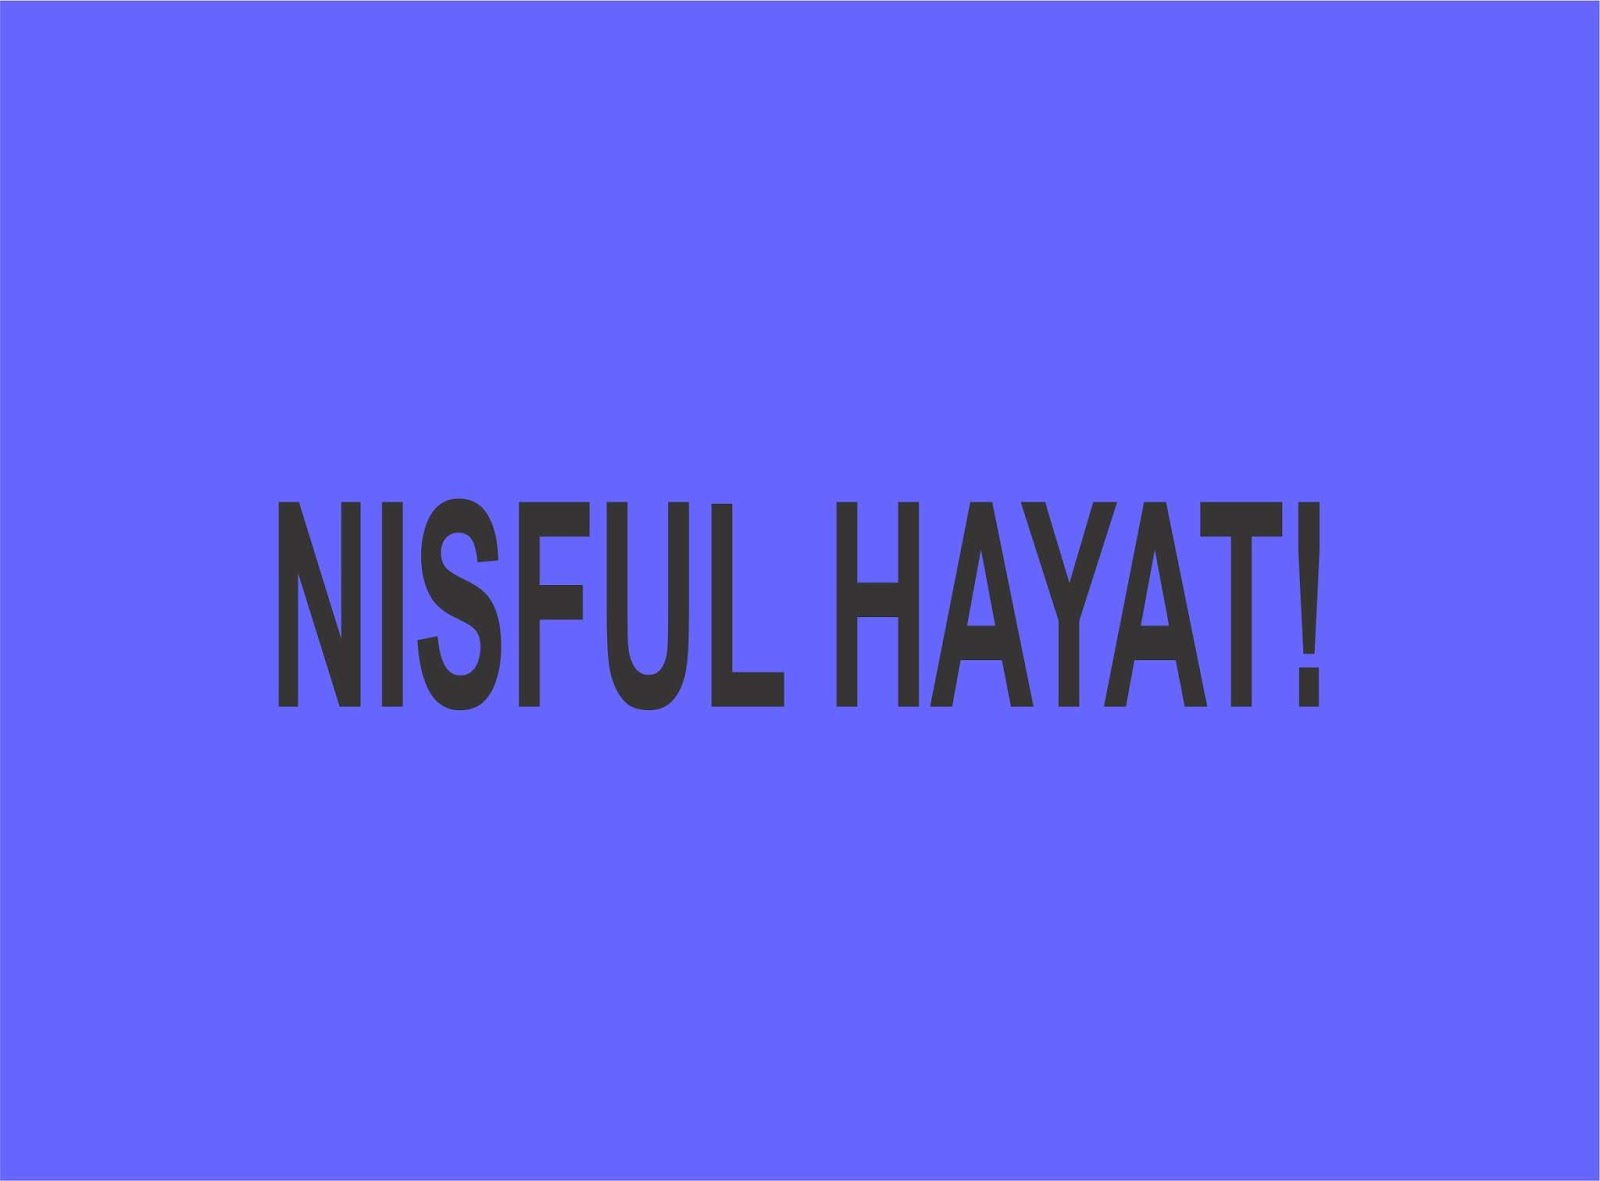 NISFUL HAYAT! COMPLETE latest hausa novel - Gidan Labarai